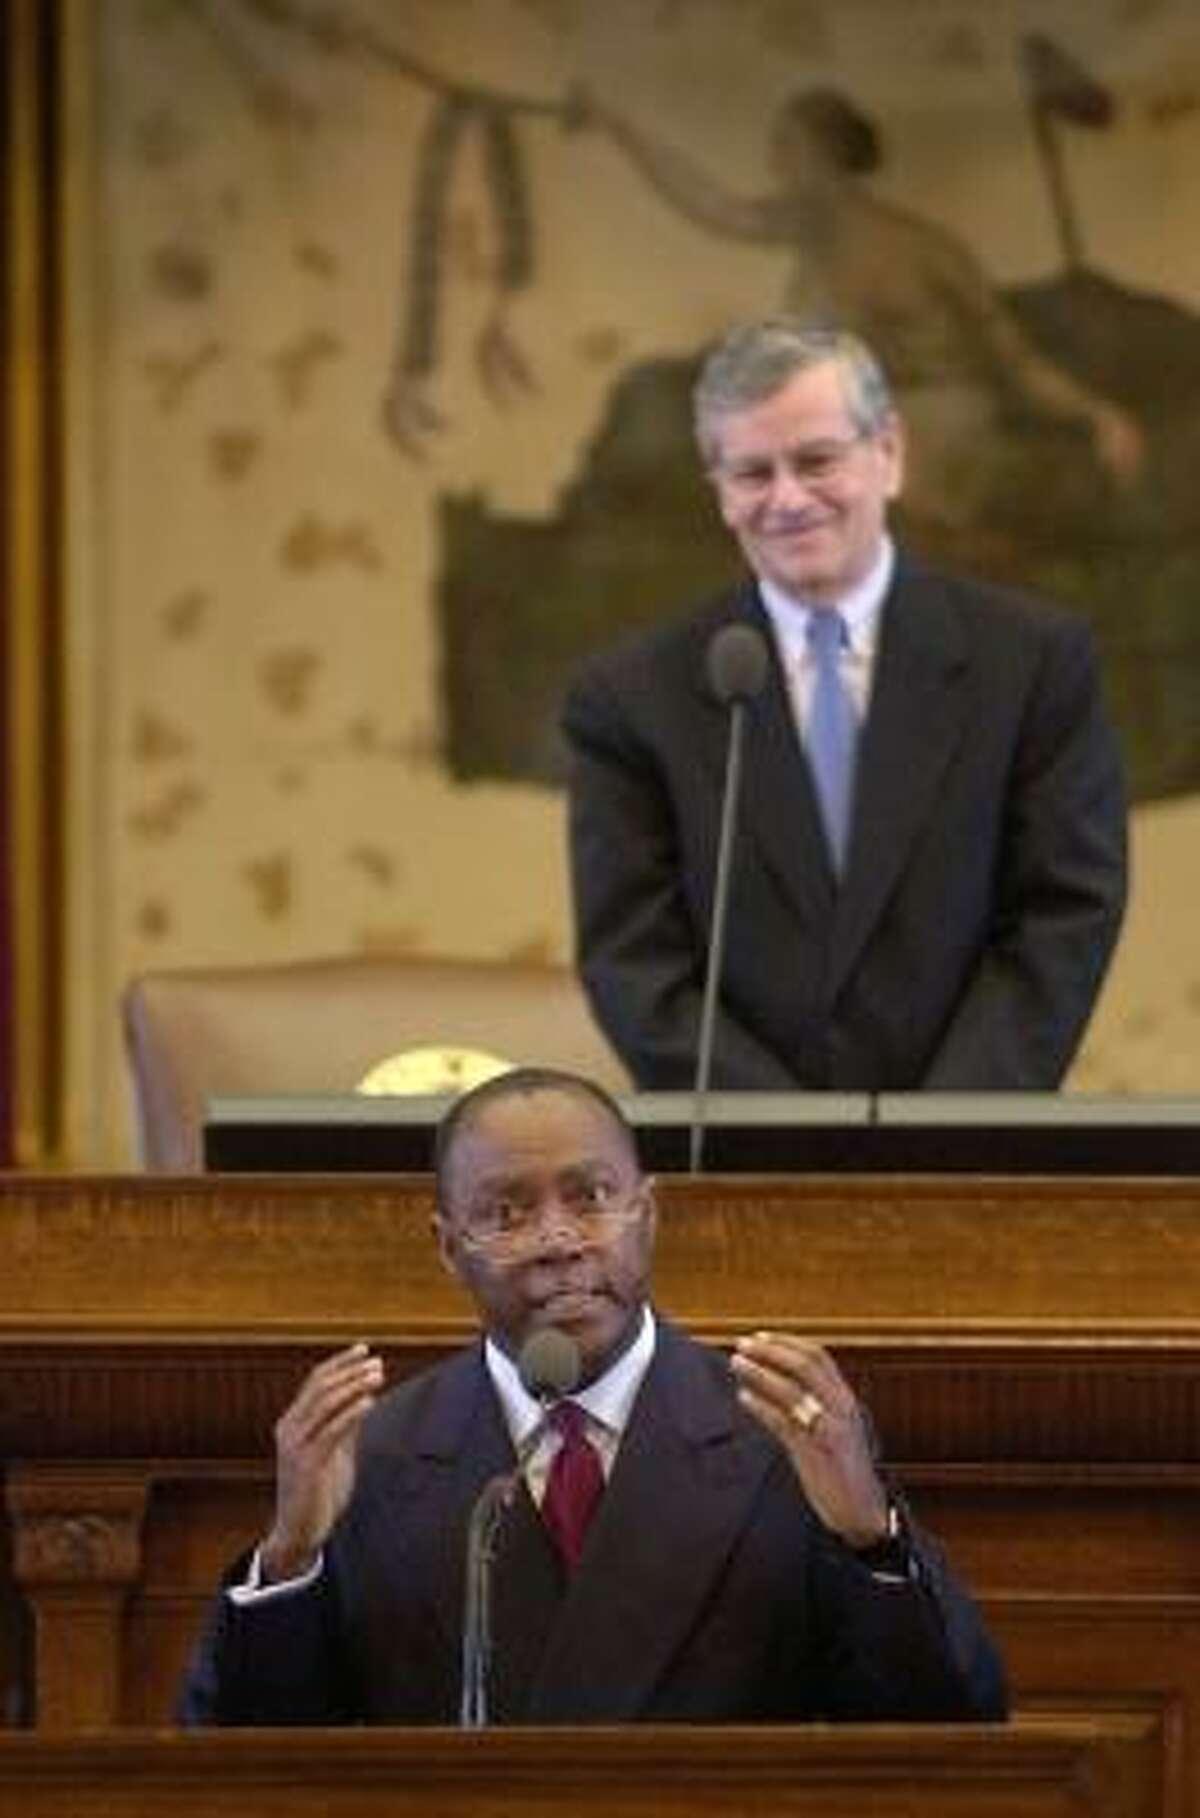 Rep. Sylvester Turner, D-Houston, shown addressing the state House in 2003, says he's still be loyal to Speaker Tom Craddick, background.